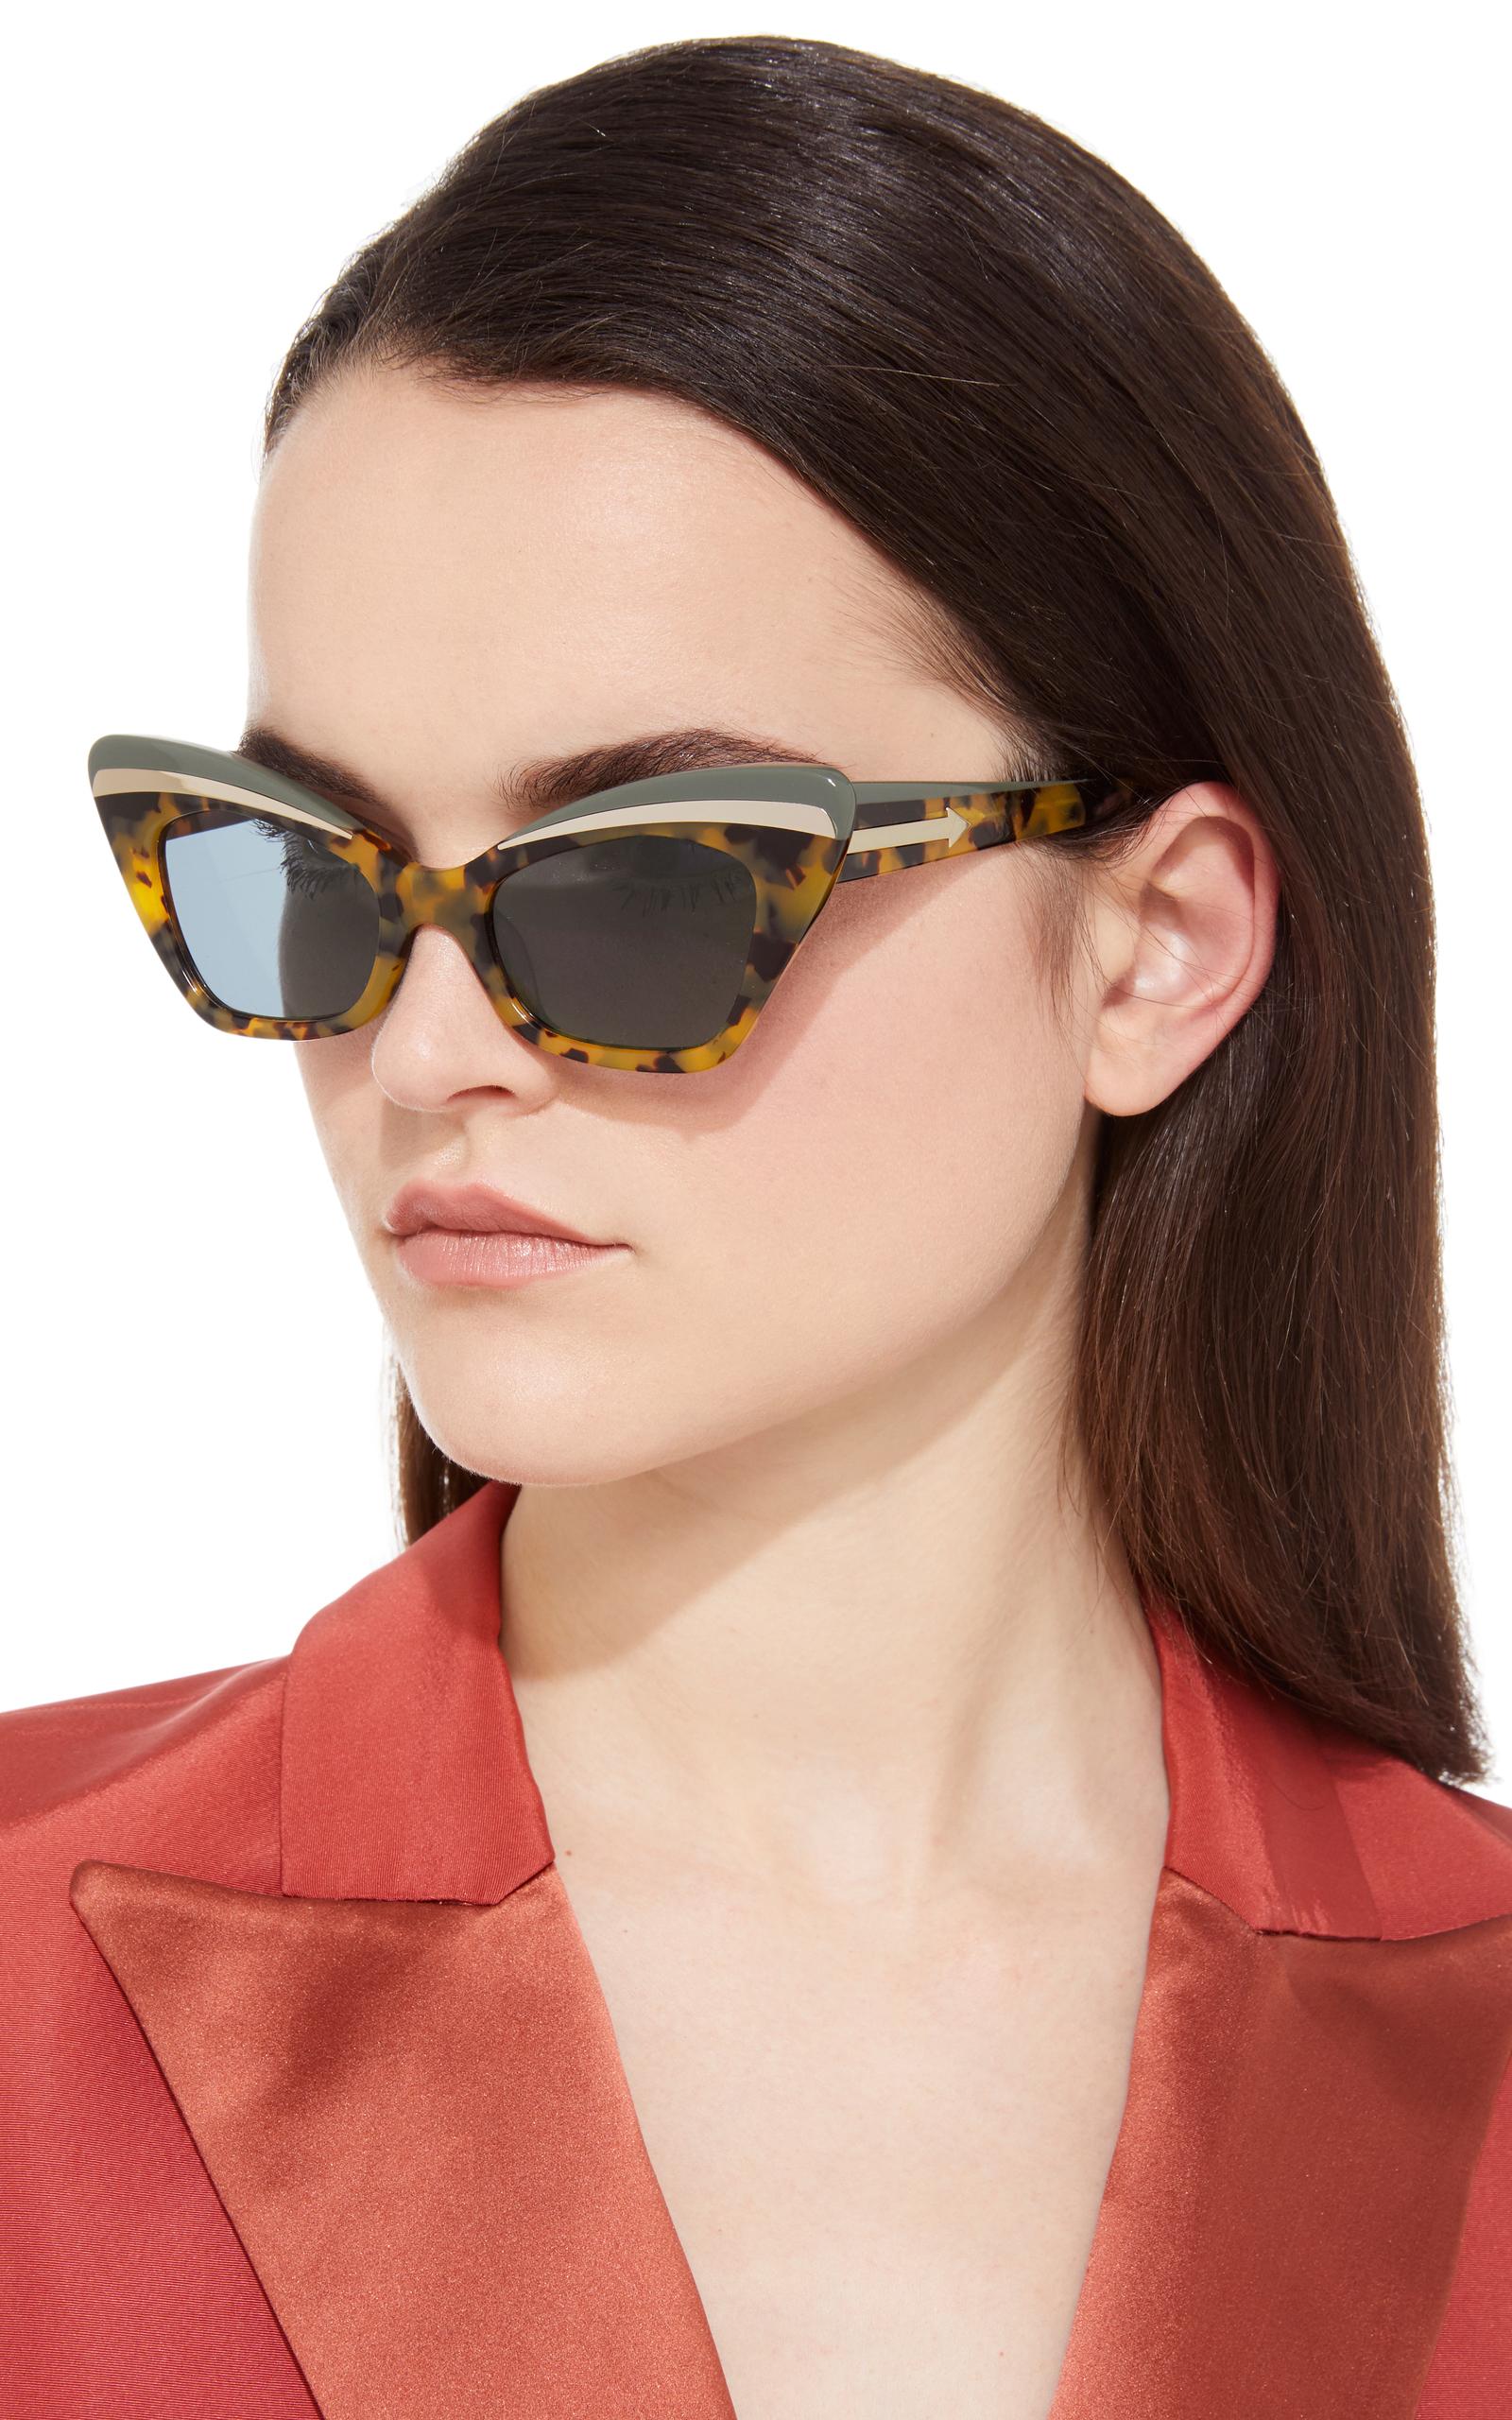 c5baf3a97306 Karen WalkerBabou Cat-Eye Tortoiseshell Acetate and Metal Sunglasses. CLOSE.  Loading